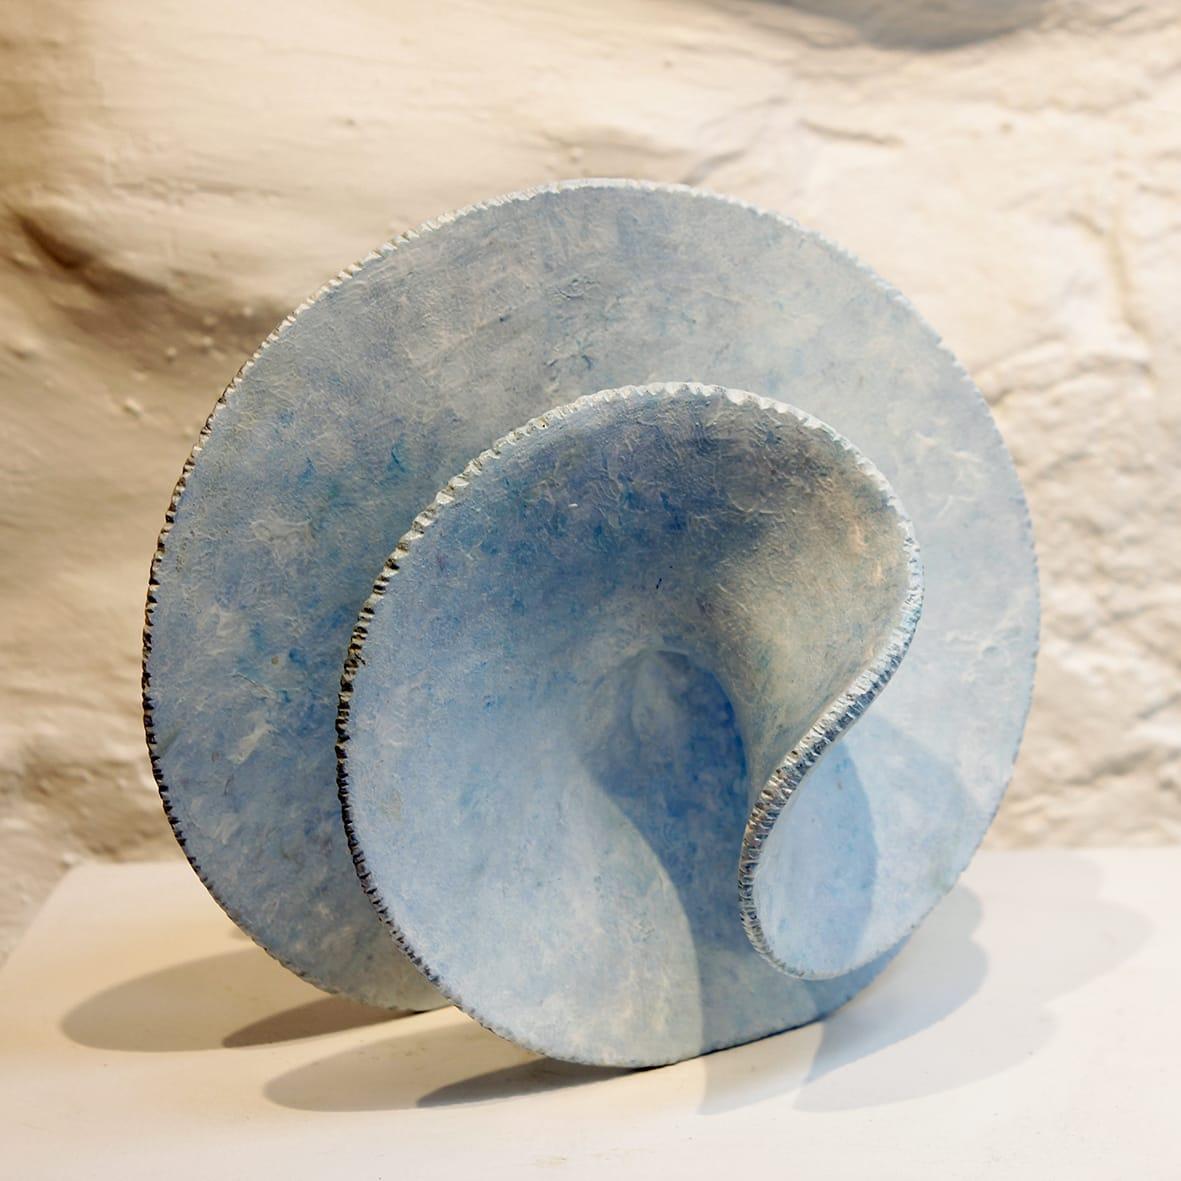 "<span class=""link fancybox-details-link""><a href=""/artists/38-antonia-salmon/works/6052-antonia-salmon-surf-riffle-2018/"">View Detail Page</a></span><div class=""artist""><strong>Antonia Salmon</strong></div> b. 1959 <div class=""title""><em>Surf Riffle</em>, 2018</div> <div class=""signed_and_dated"">stamped AS</div> <div class=""medium"">ceramic</div> <div class=""dimensions"">h 19cm</div><div class=""copyright_line"">Copyright The Artist</div>"